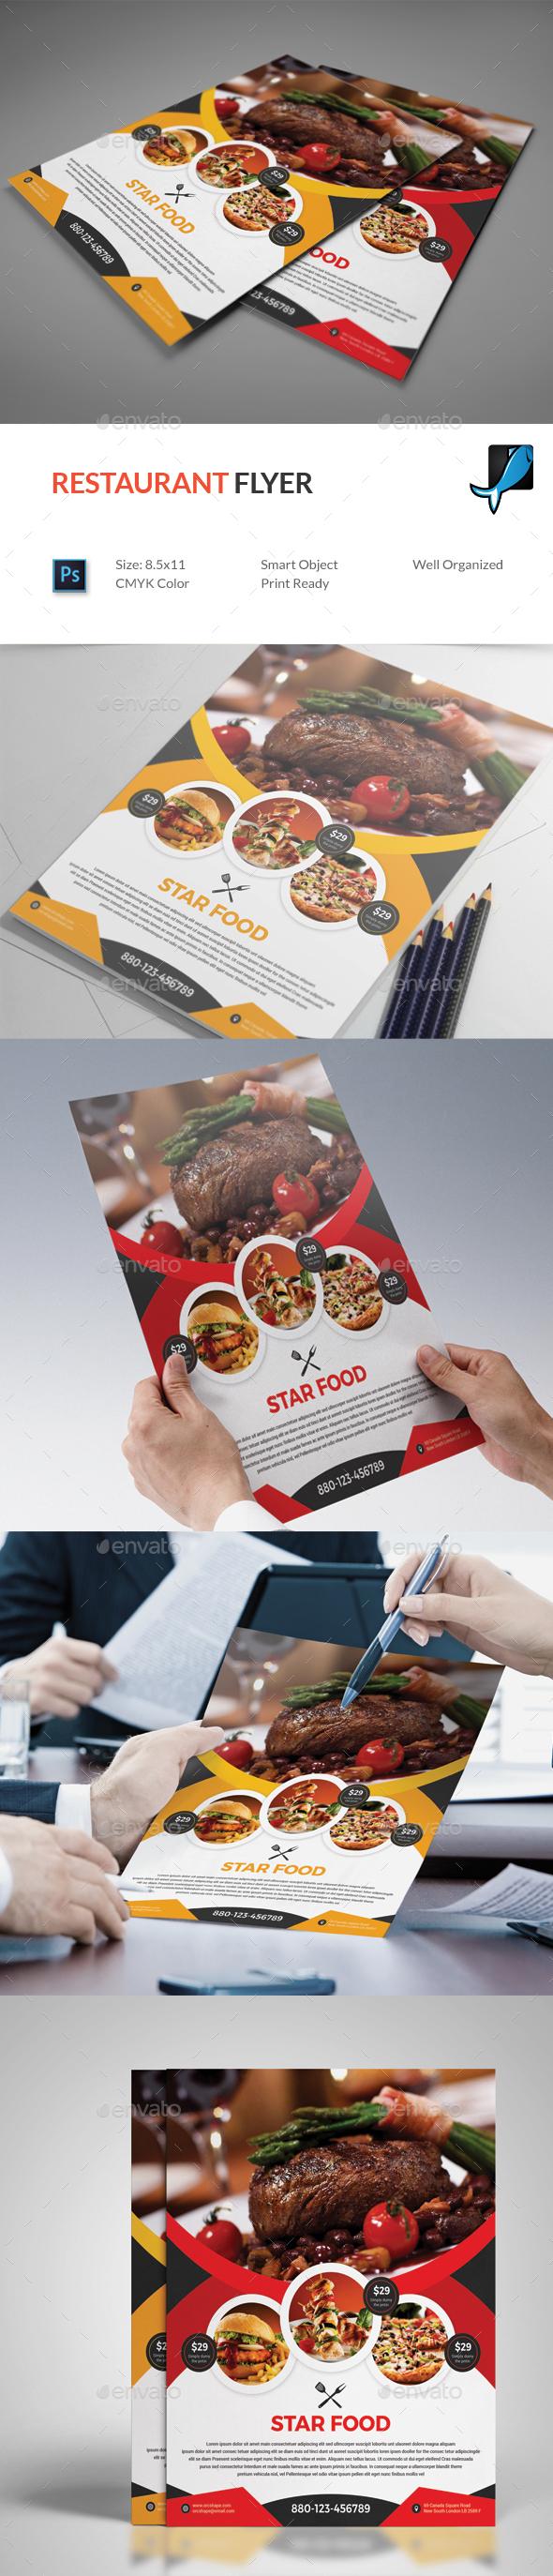 Graphicriver Restaurant Flyer 19487237